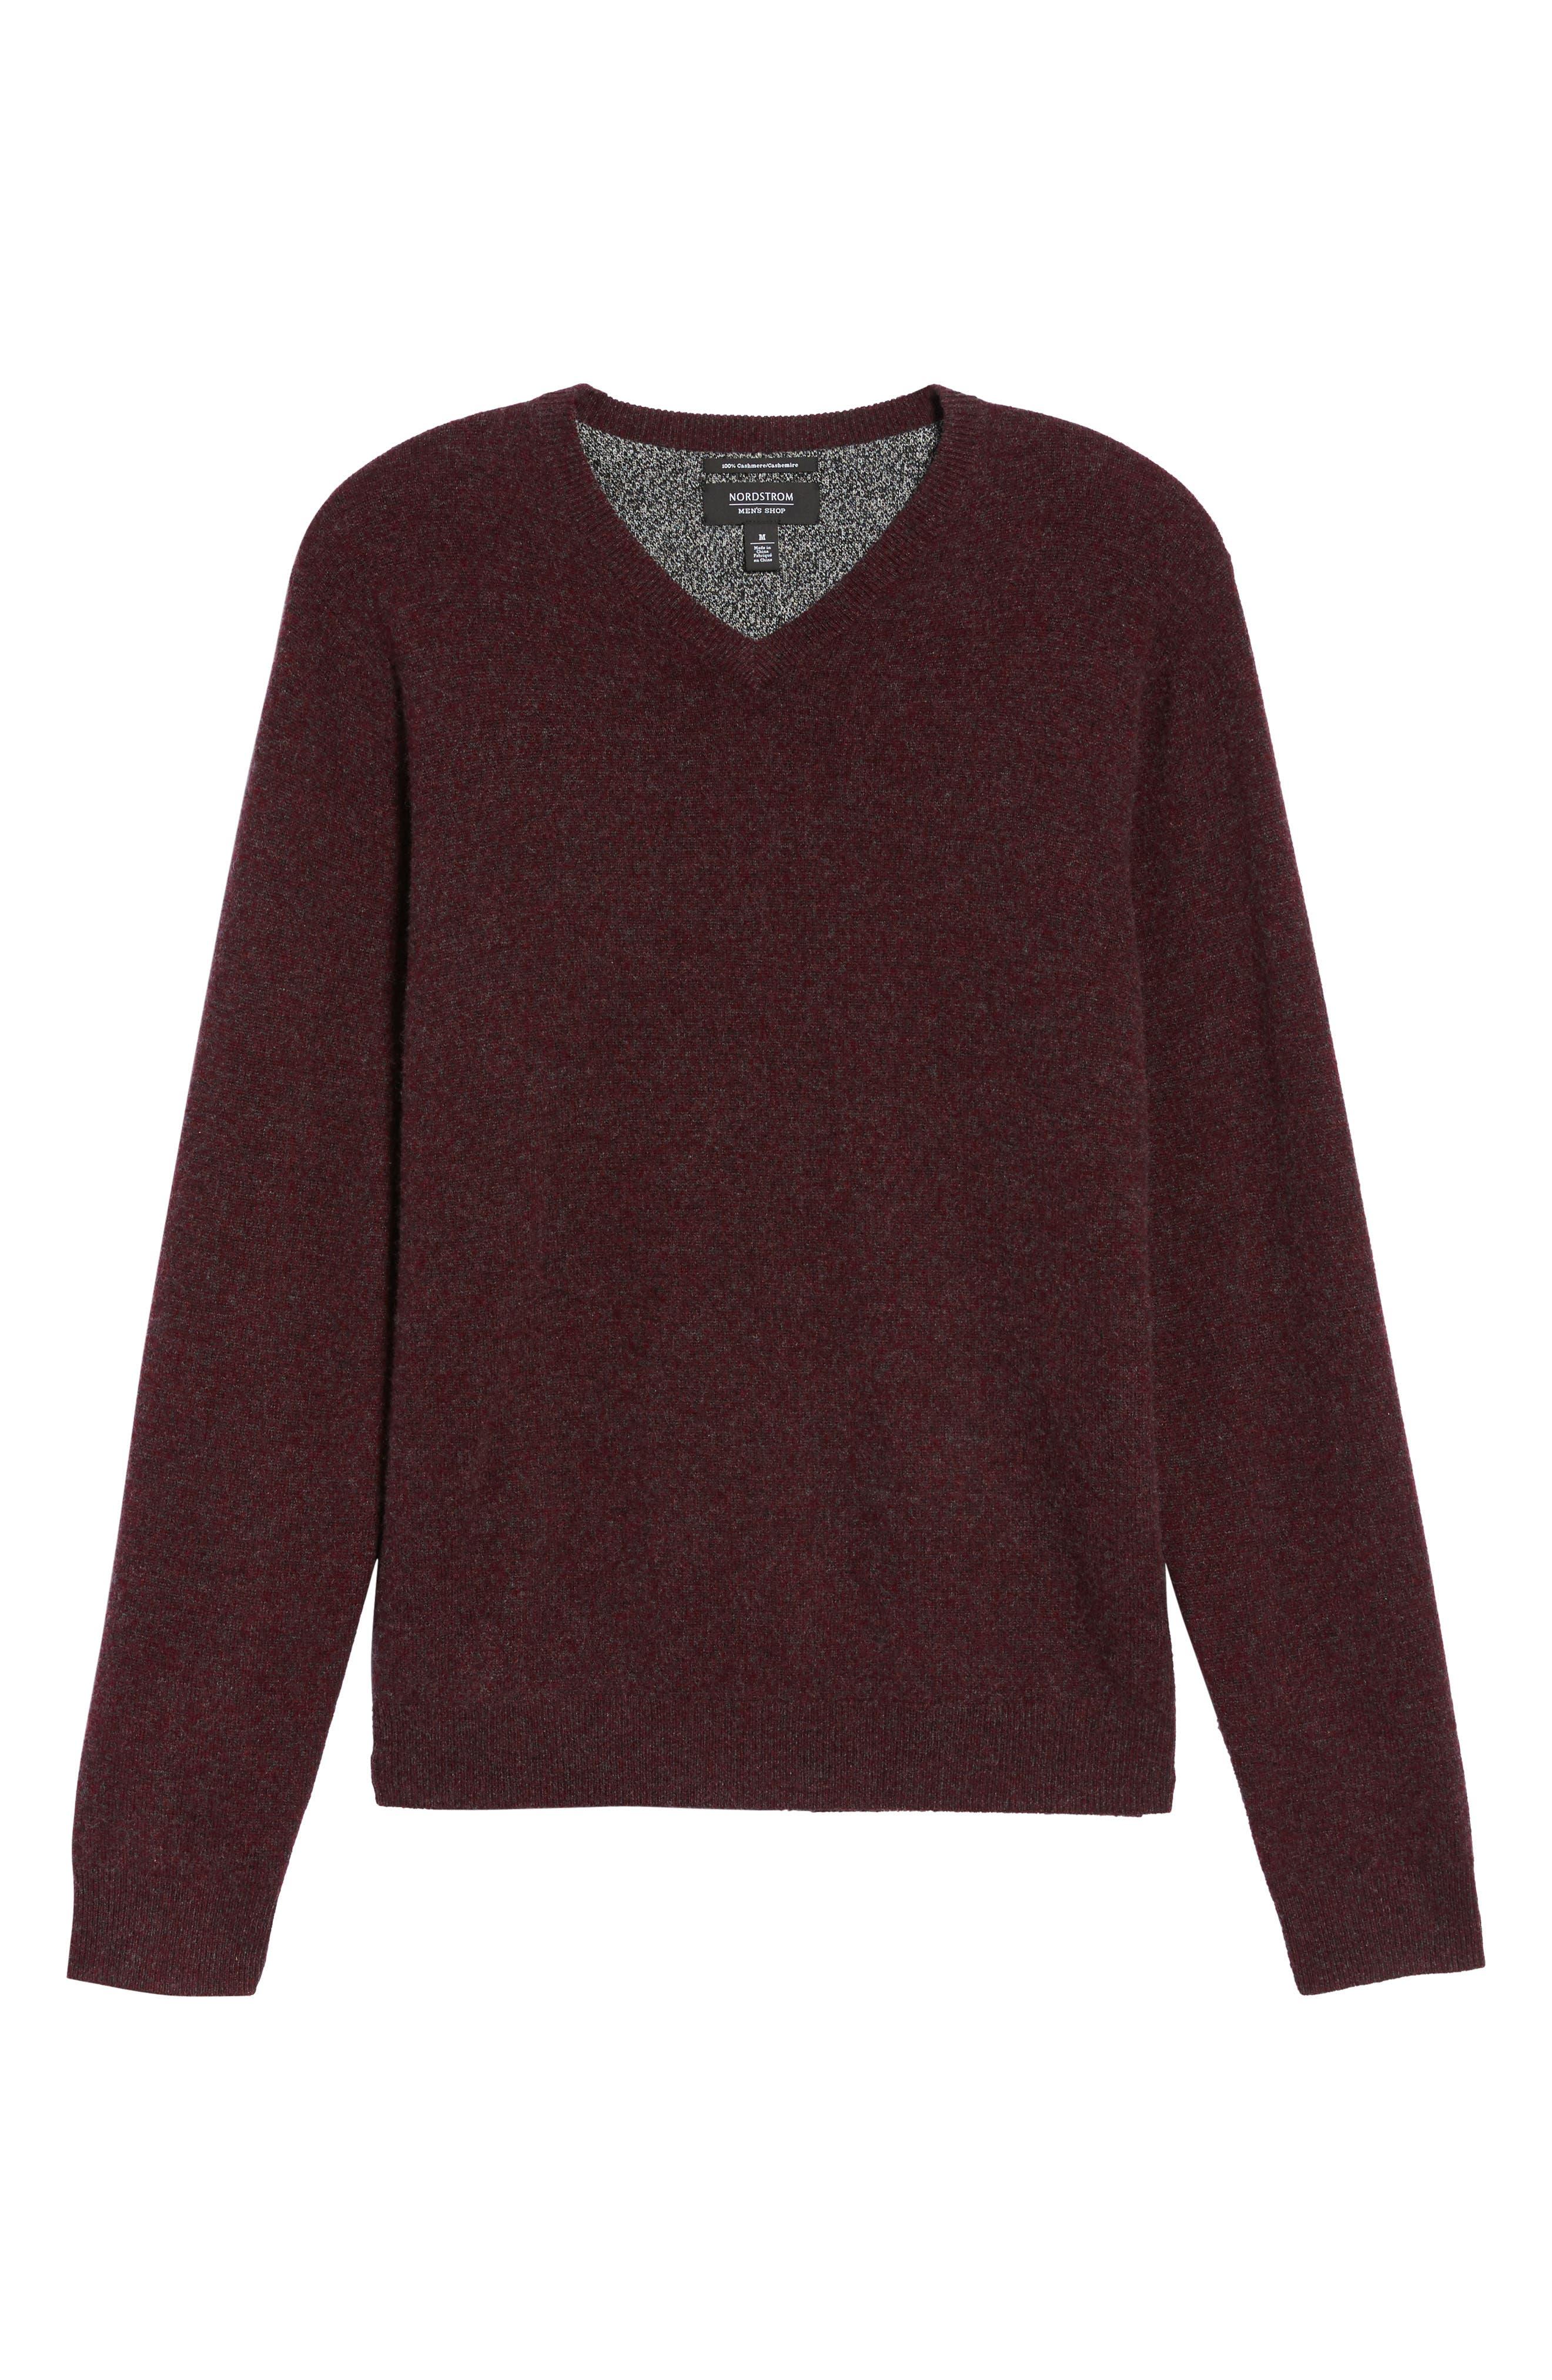 Cashmere V-Neck Sweater,                             Alternate thumbnail 6, color,                             Burgundy Fudge